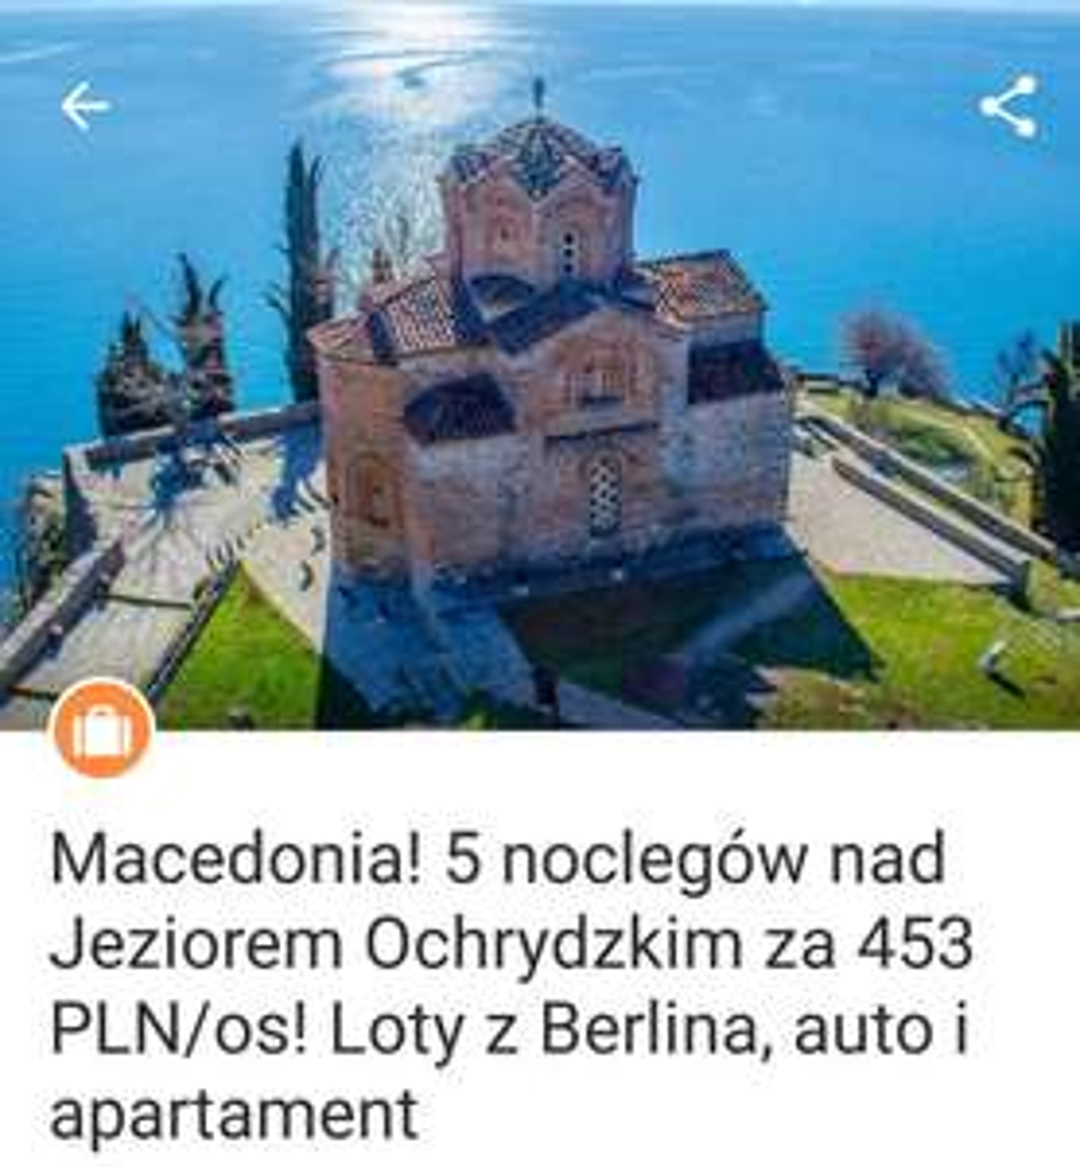 Macedonia 5 noclegów auto apartament za 453 PLN/os